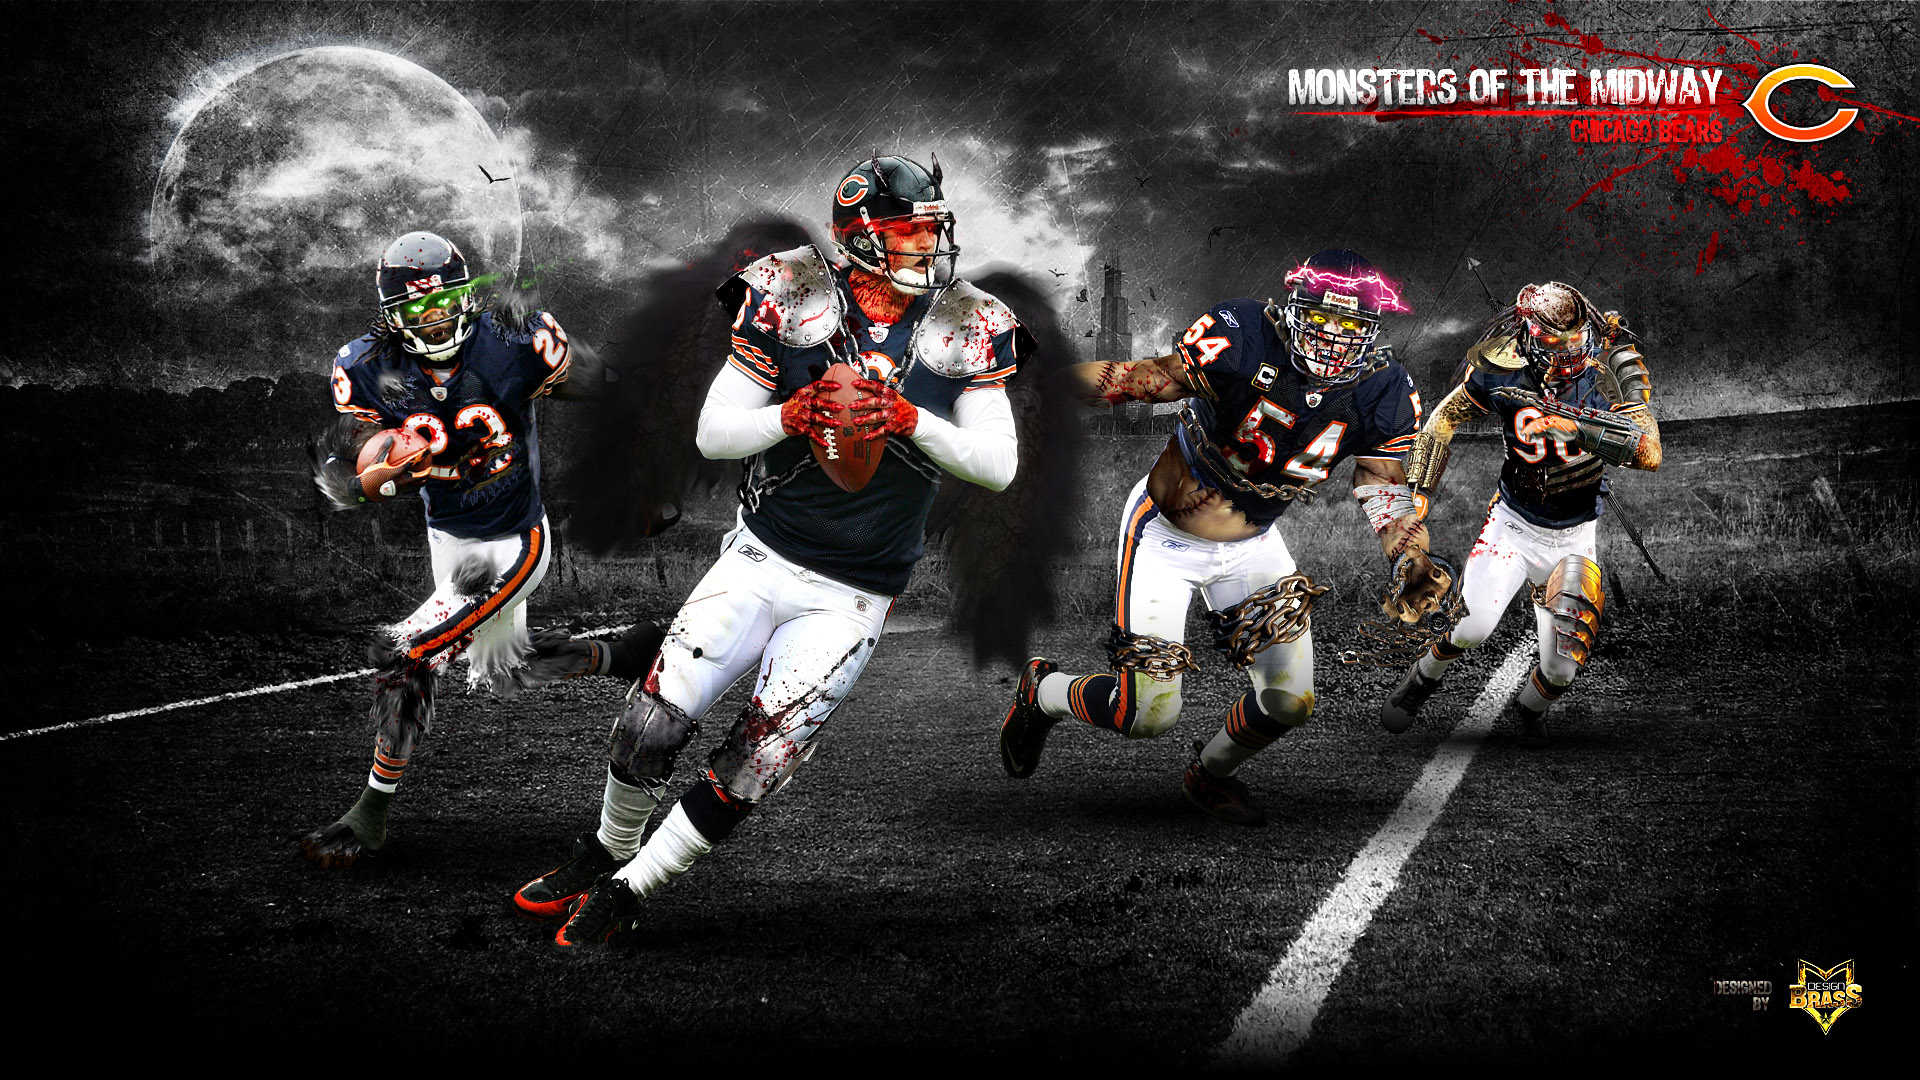 CHICAGO BEARS nfl football j wallpaper 1920x1080 156158 1920x1080